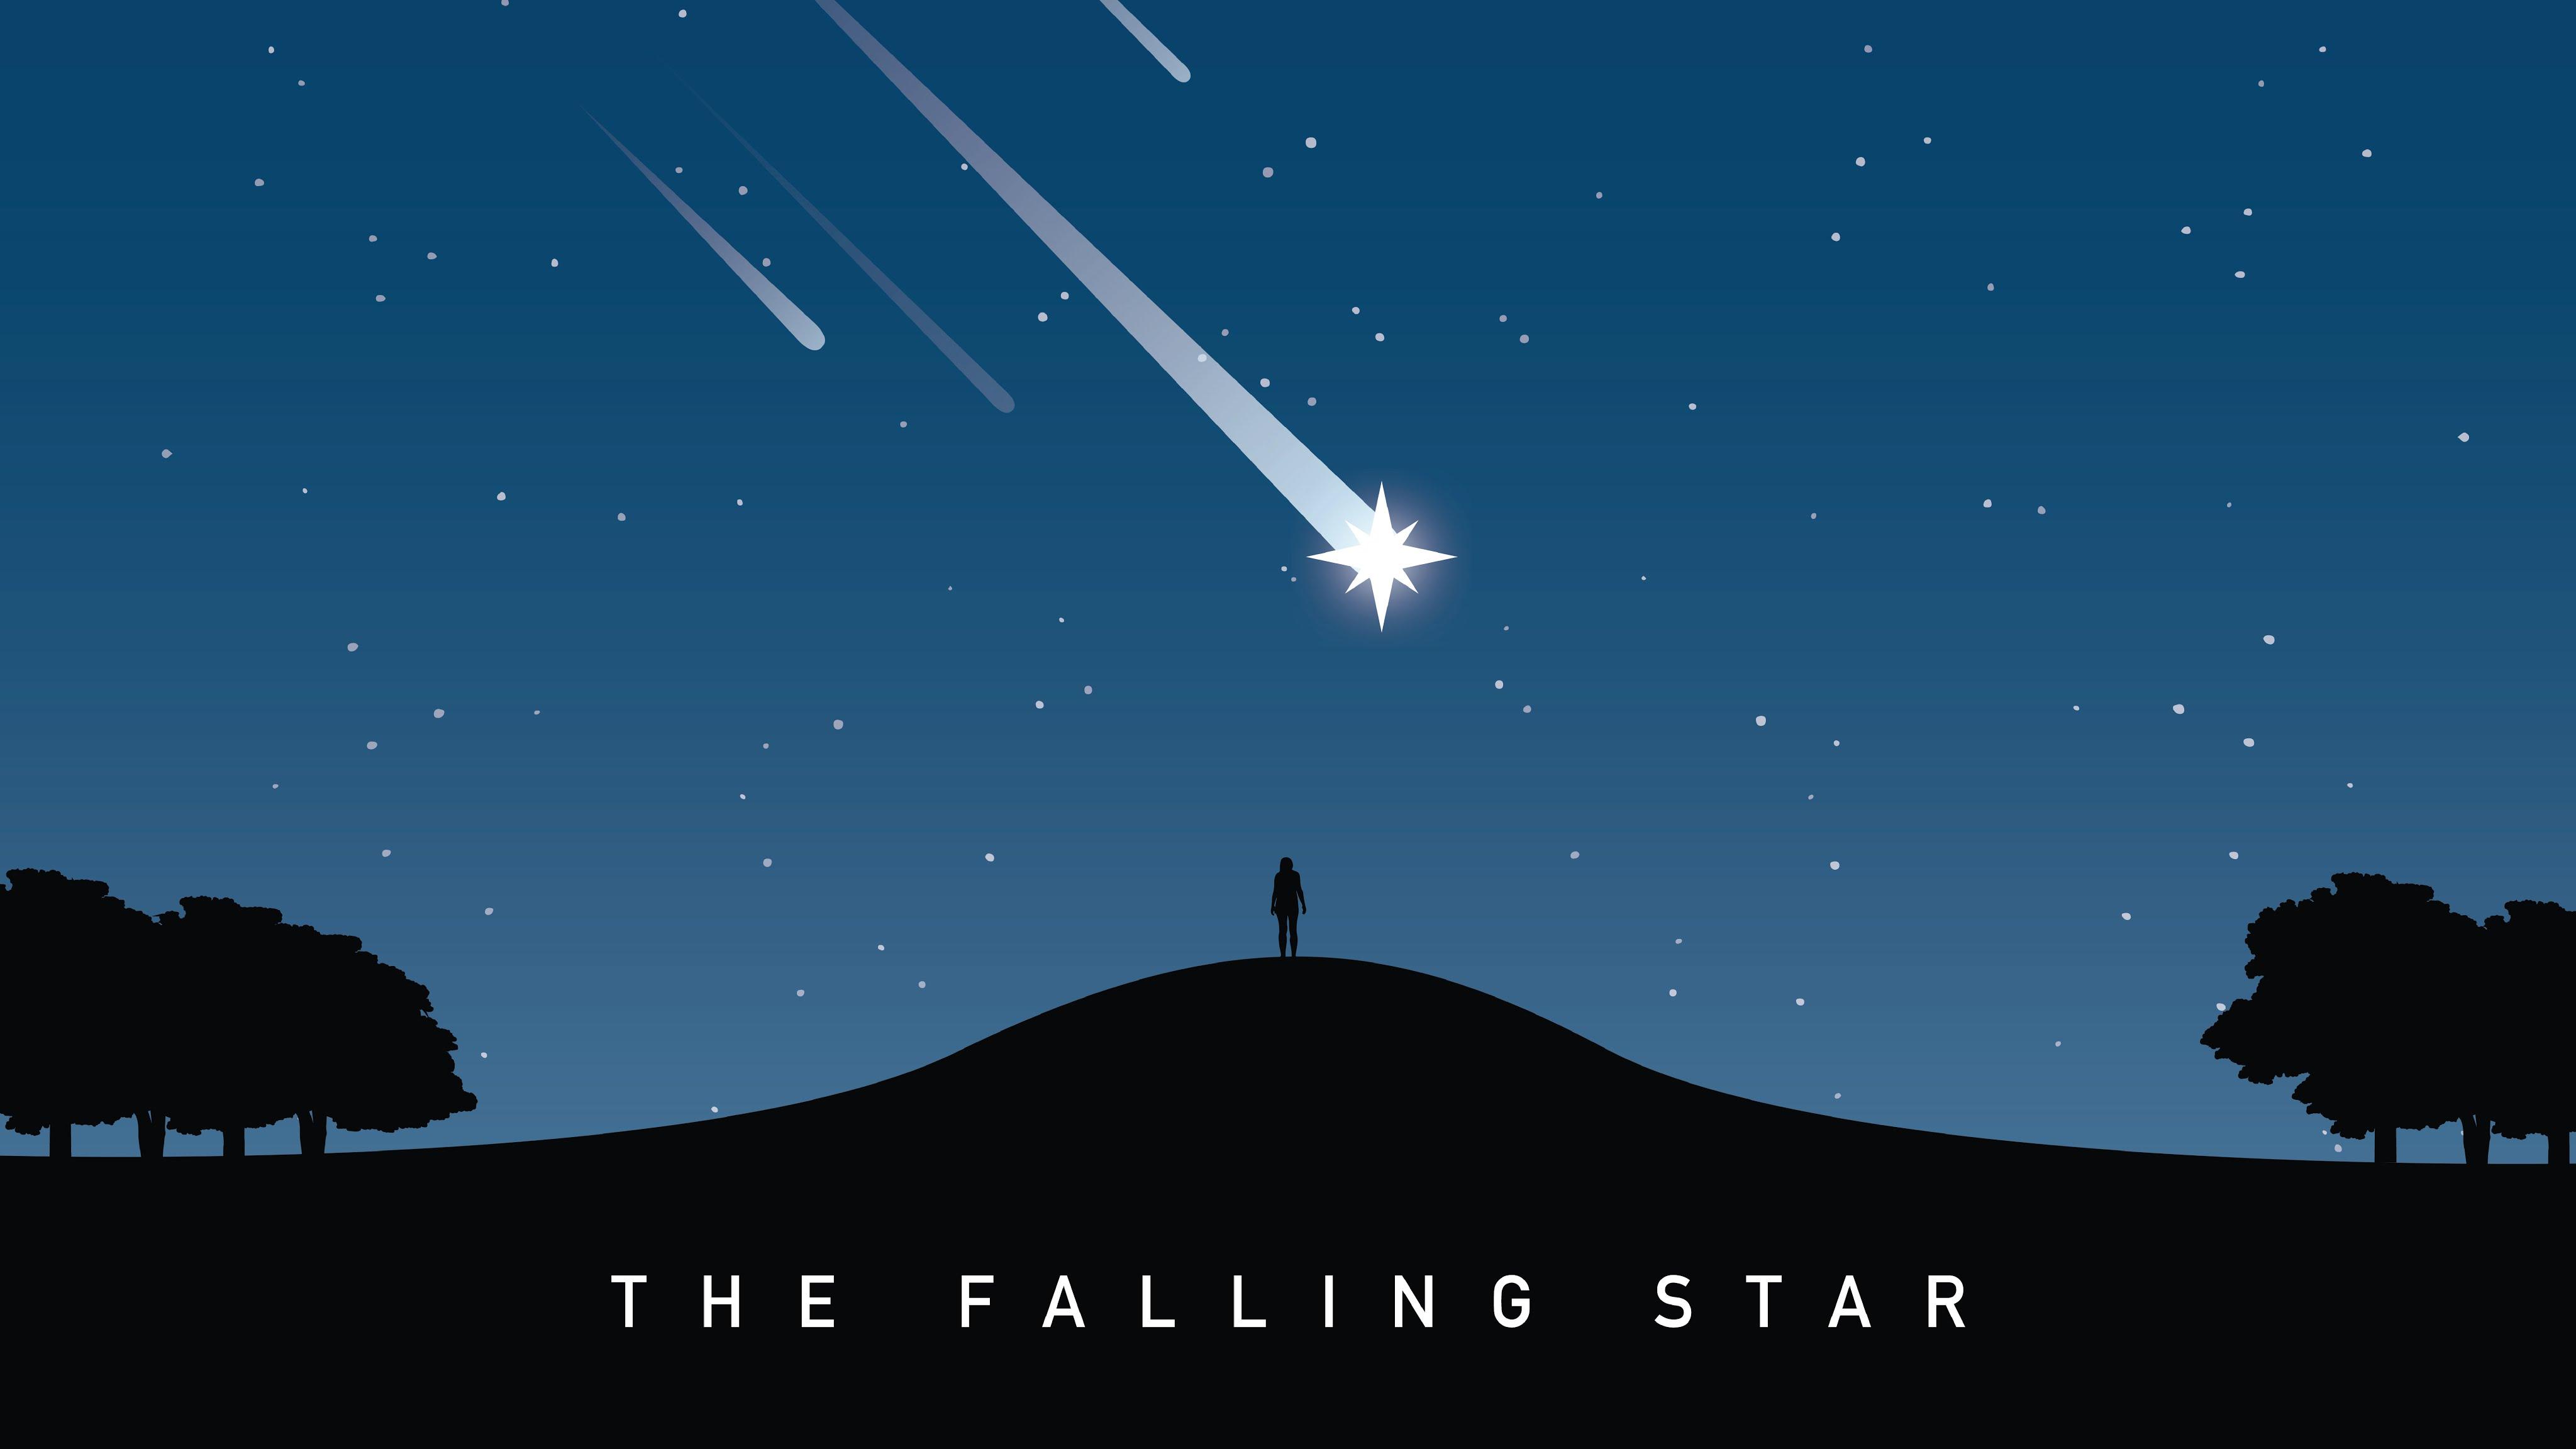 Falling star photo